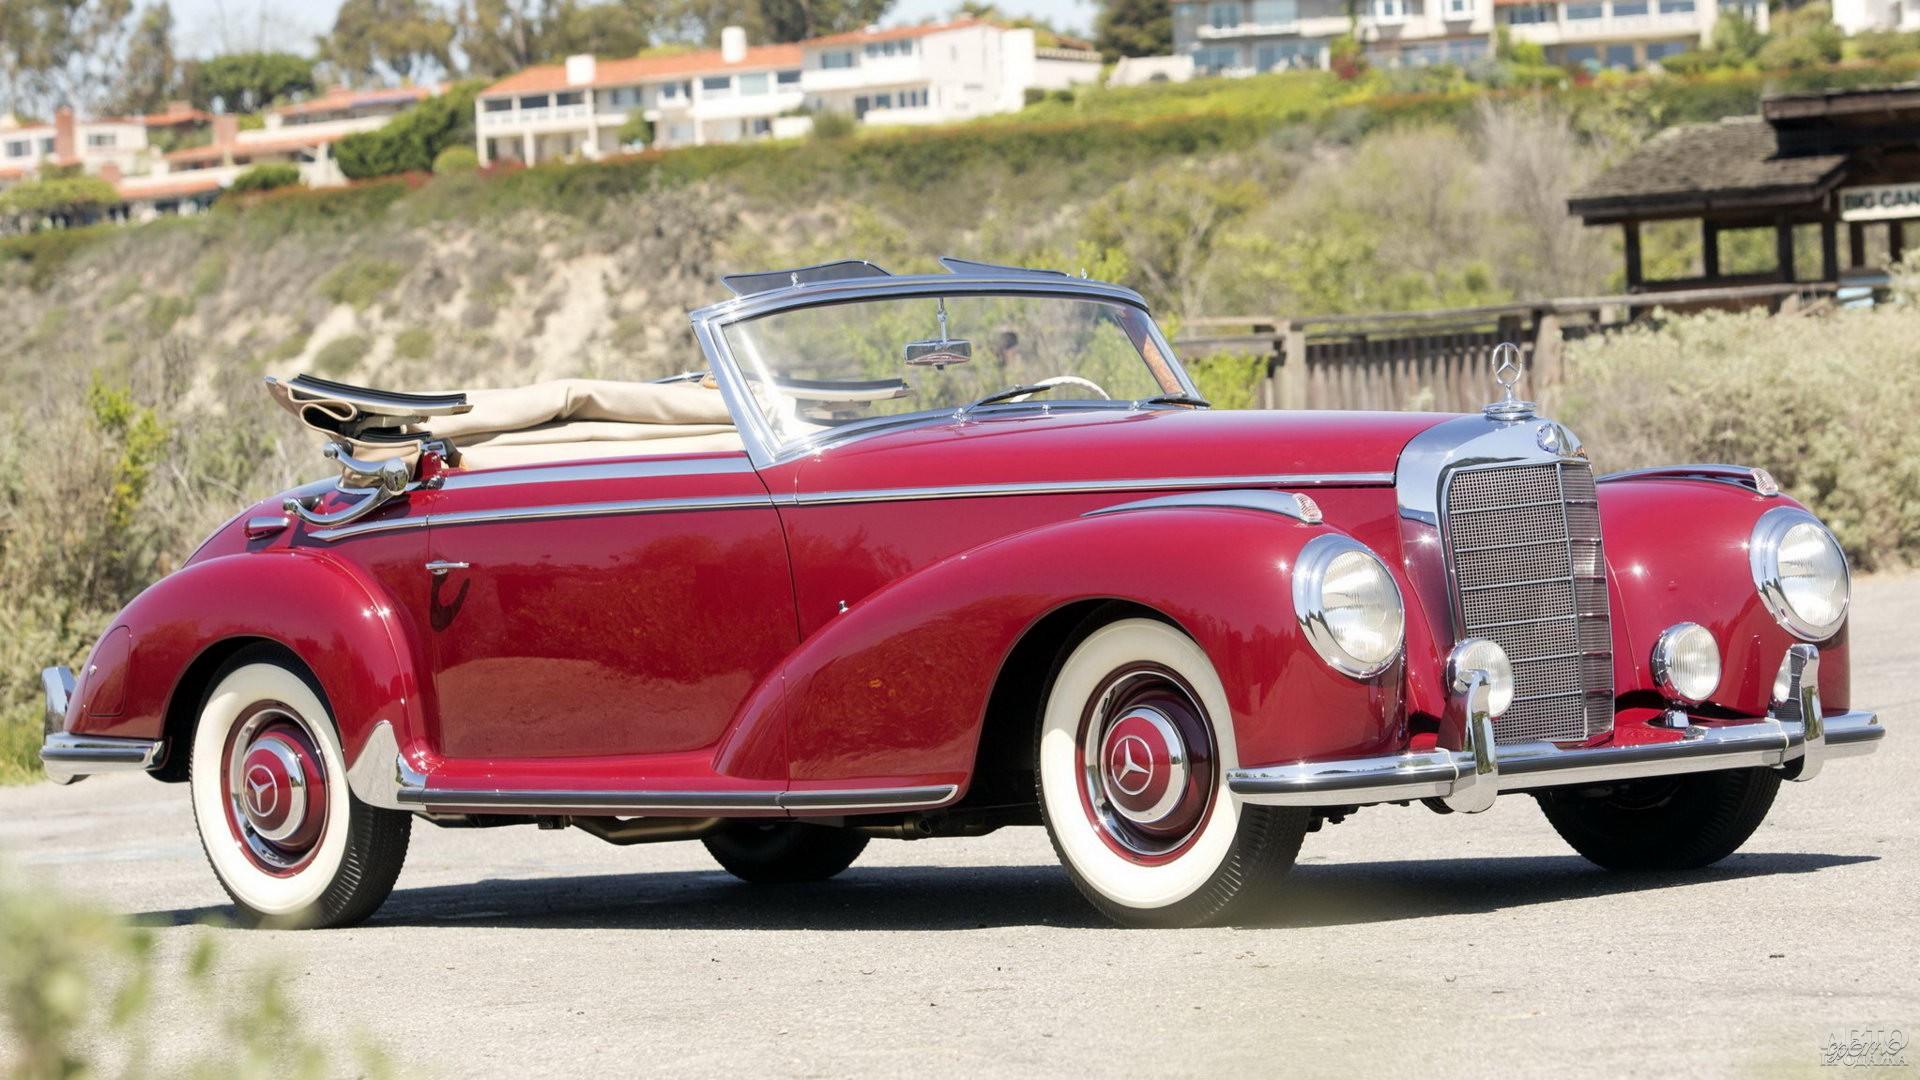 Mеrcedes-Benz 300 S Cabriolet 1951 года